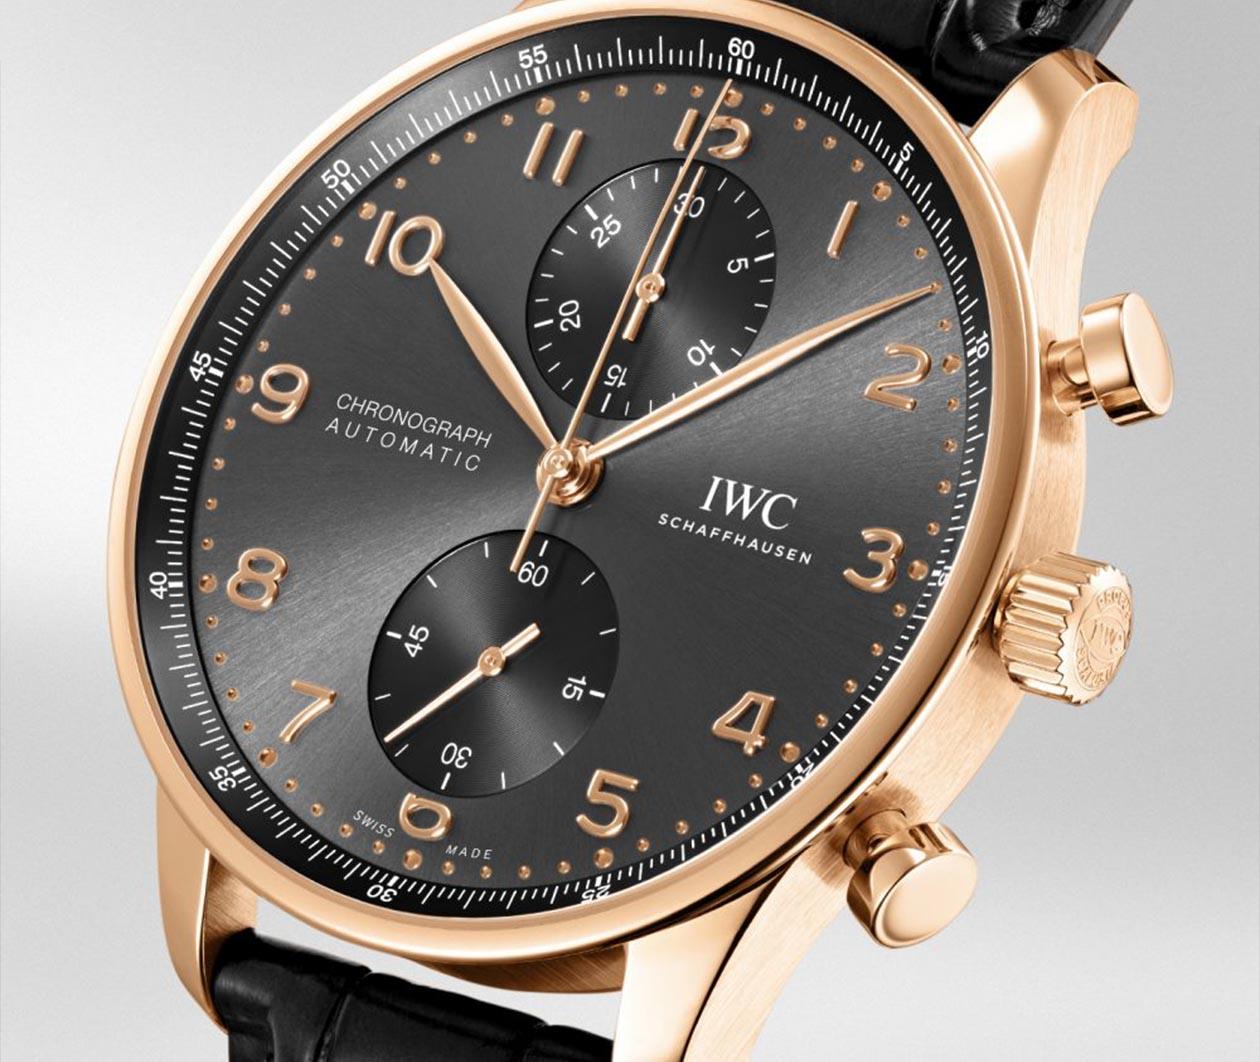 IWC Portugieser Chronograph IW371610 Carousel 3 FINAL